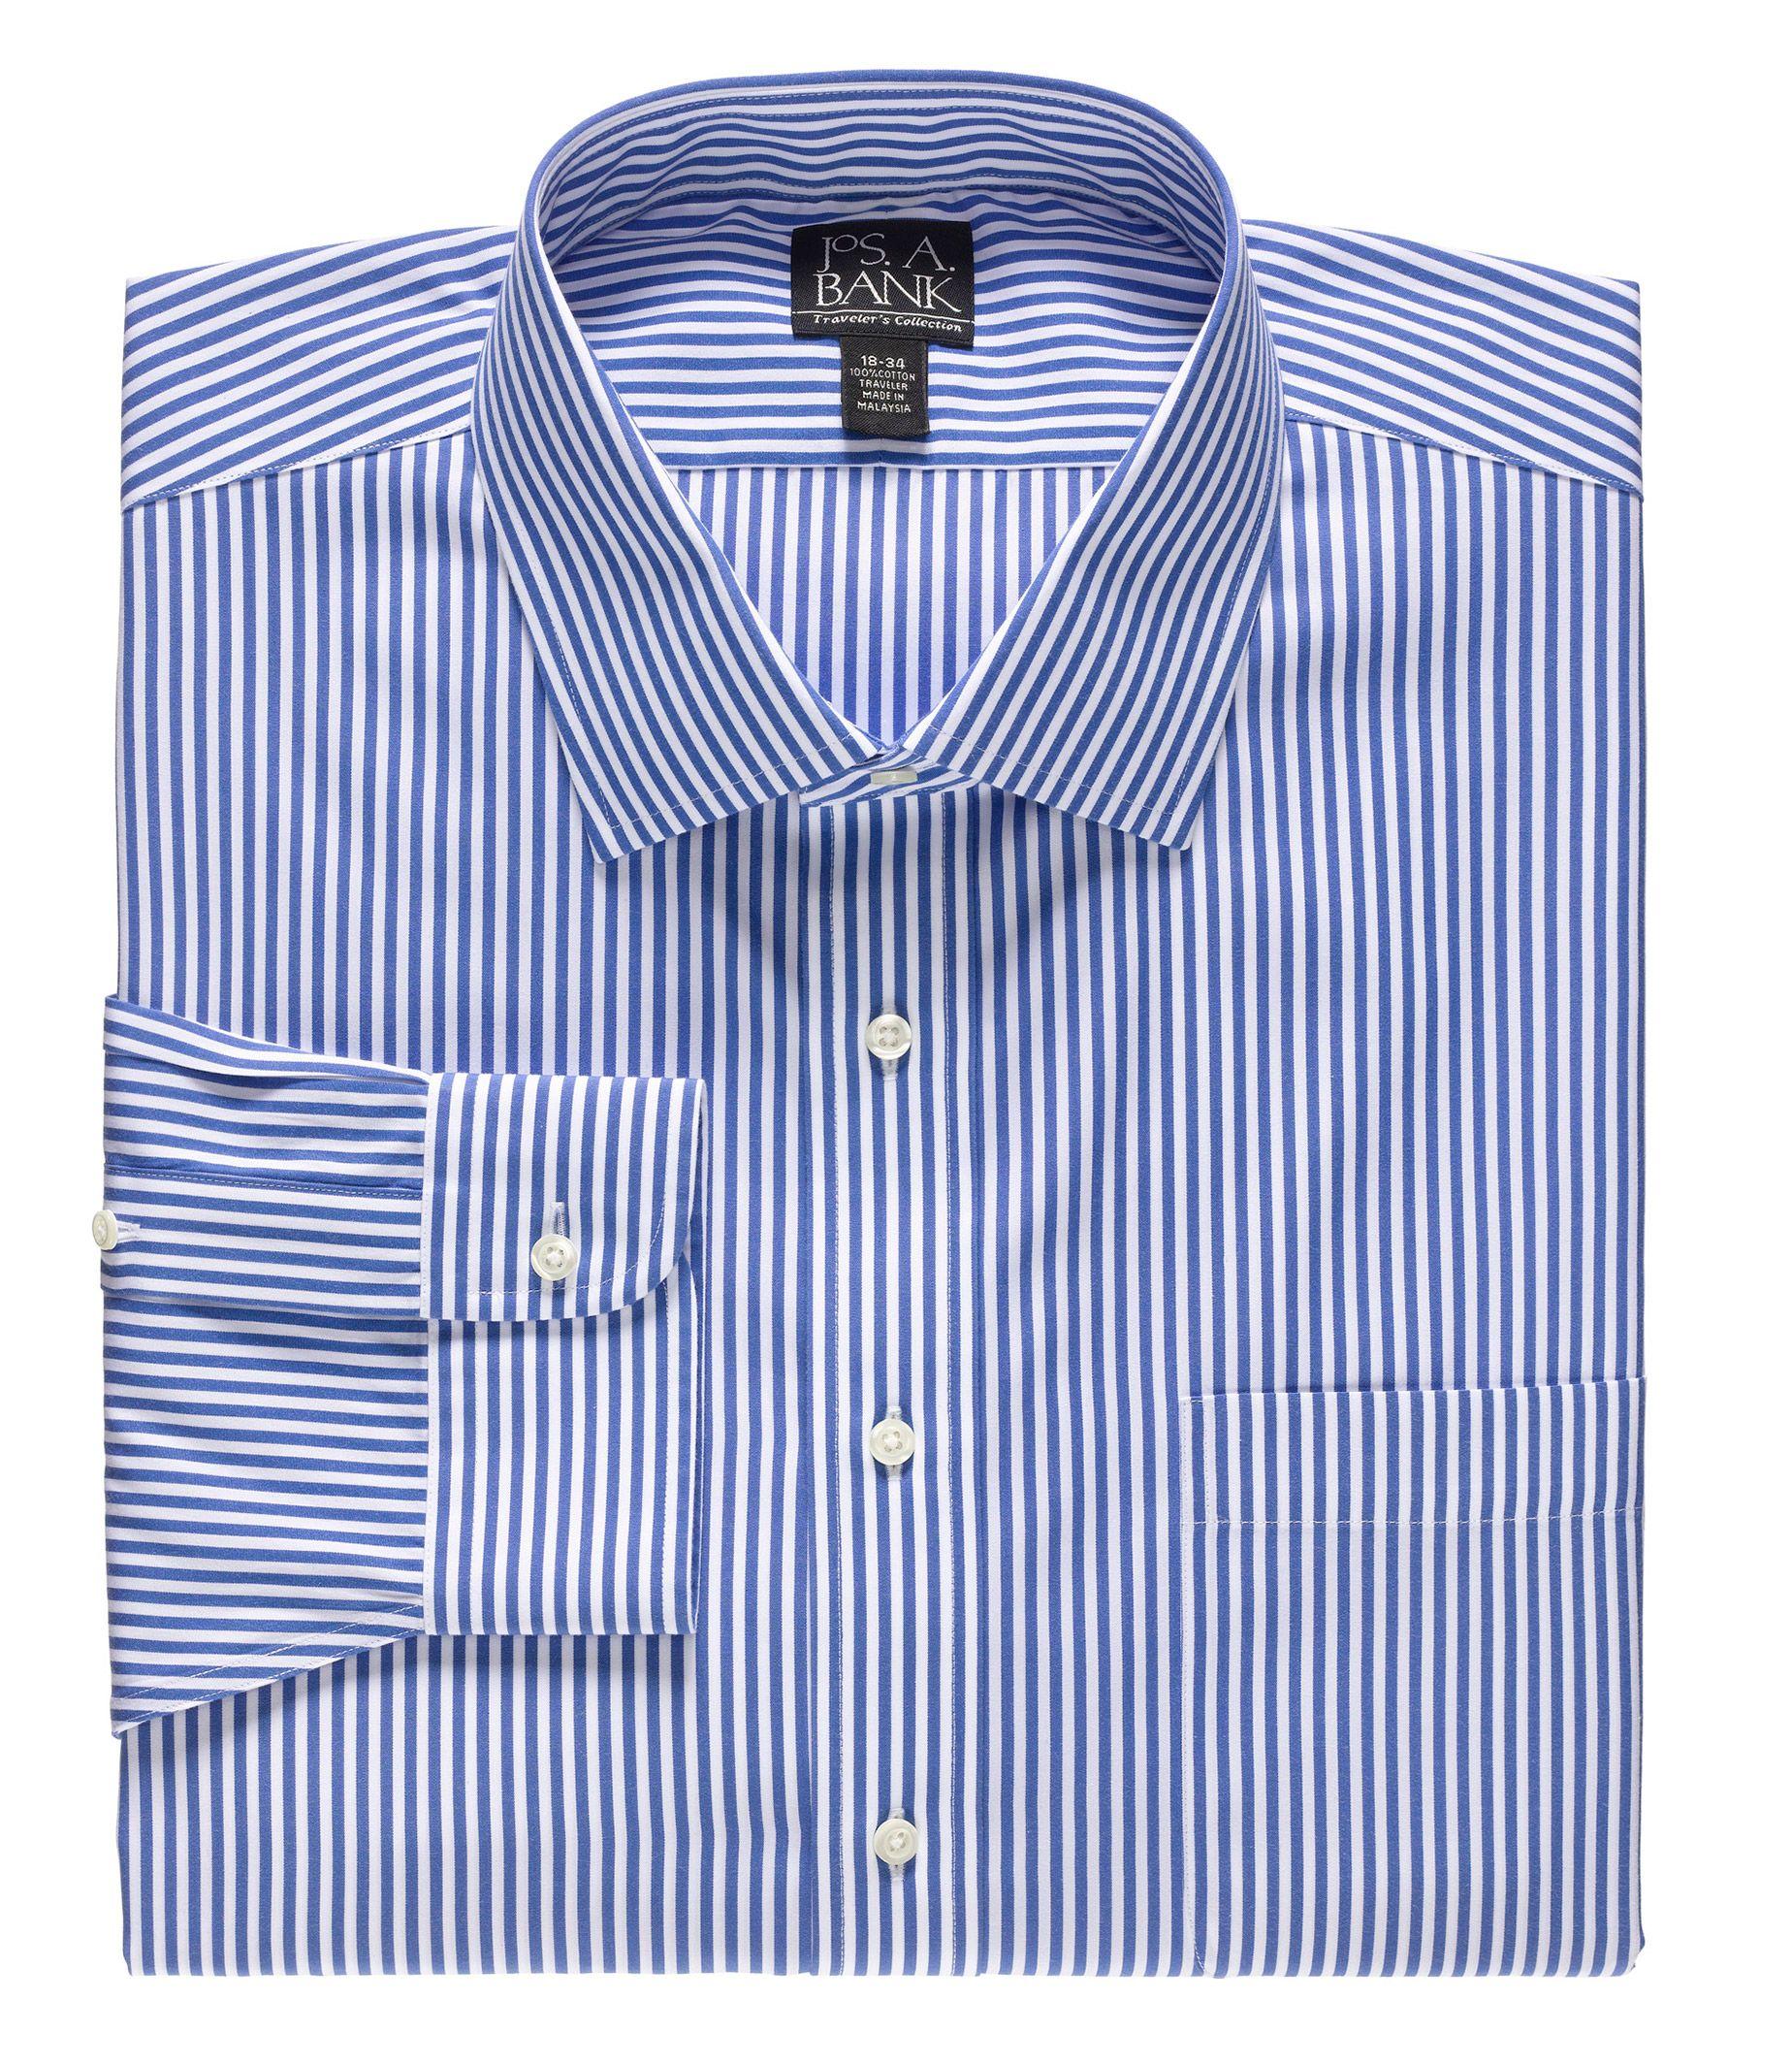 Traveler Spread Collar Dress Shirt Big or Tall.